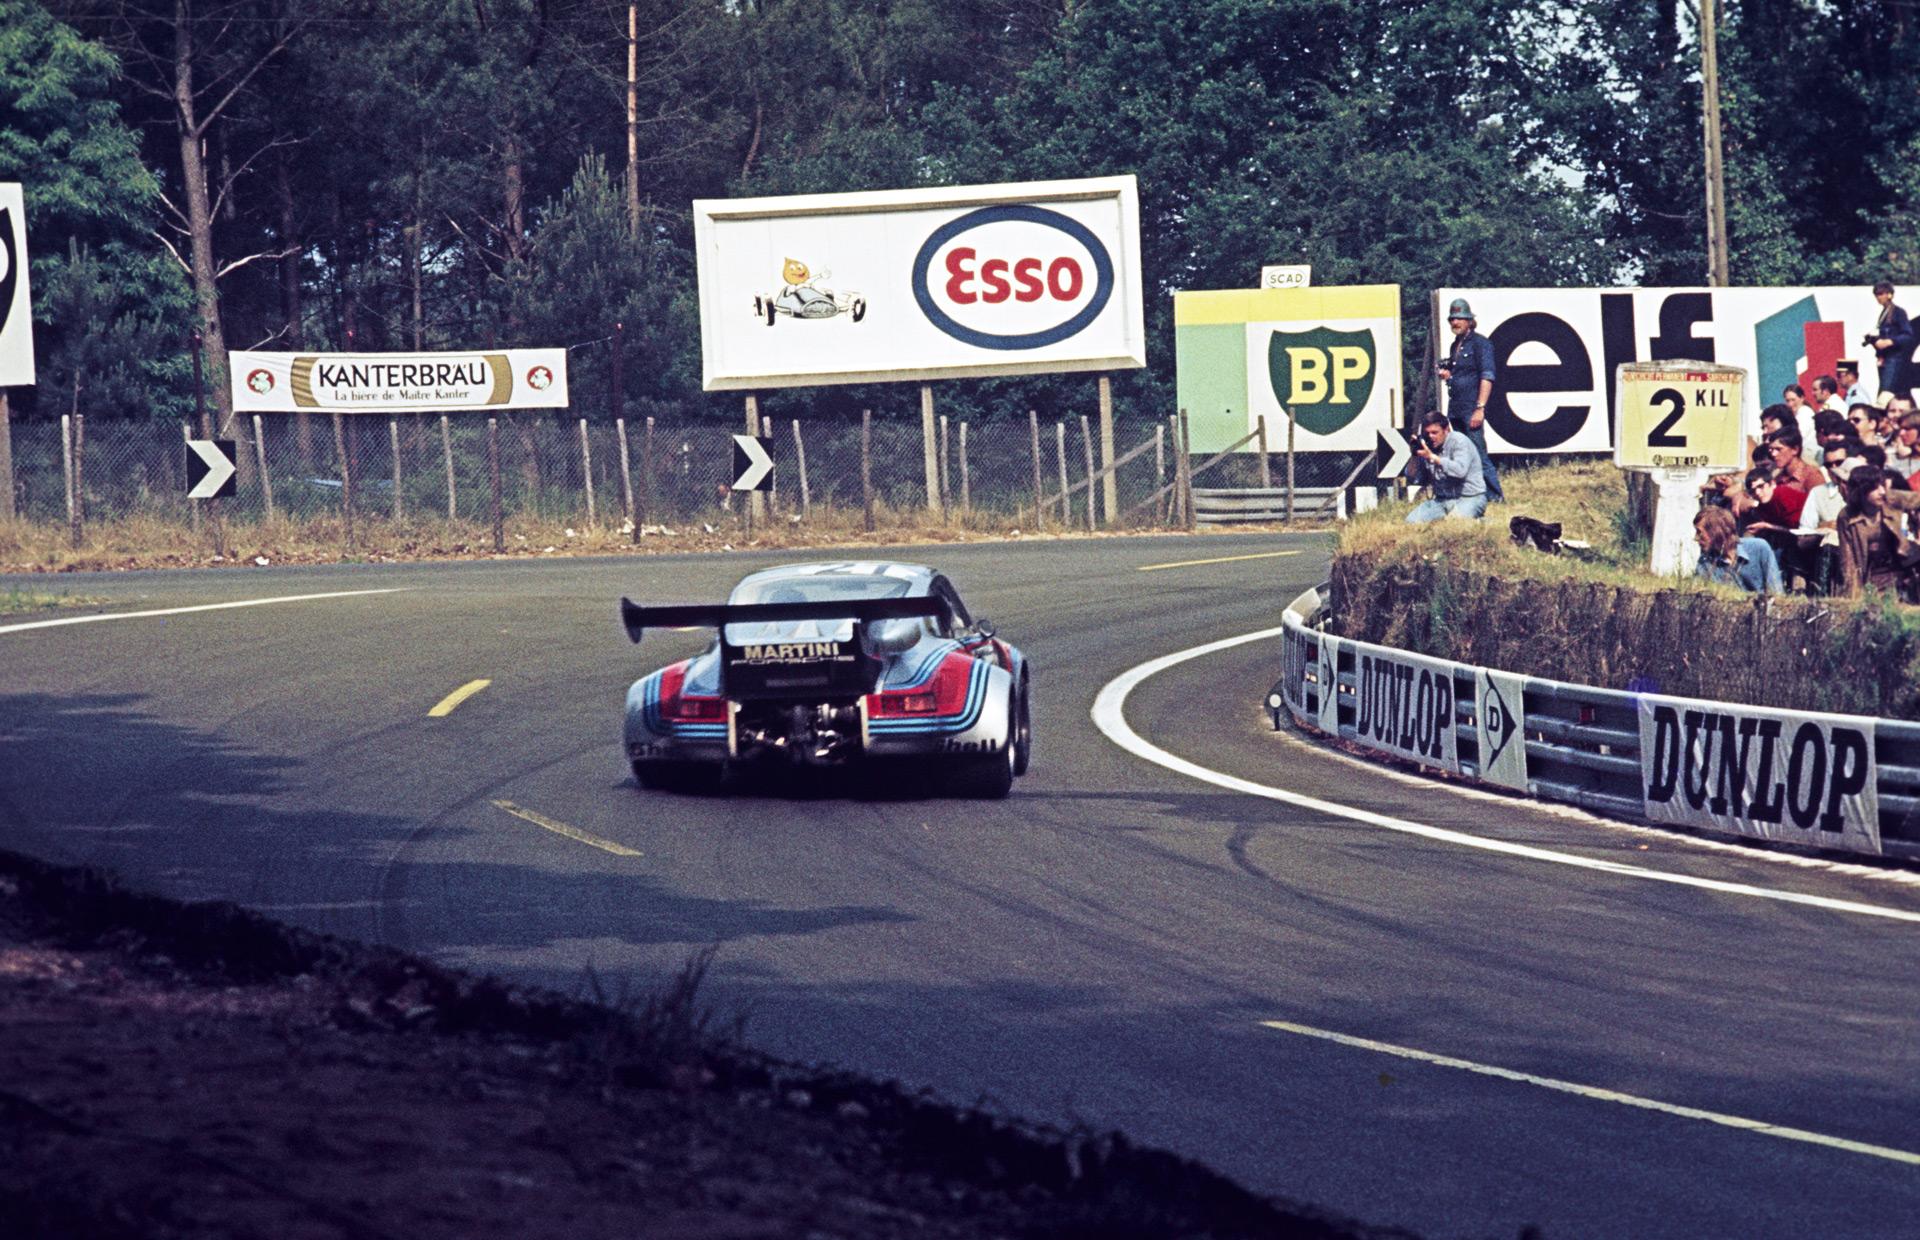 911 Carrera RSR Turbo 2.1